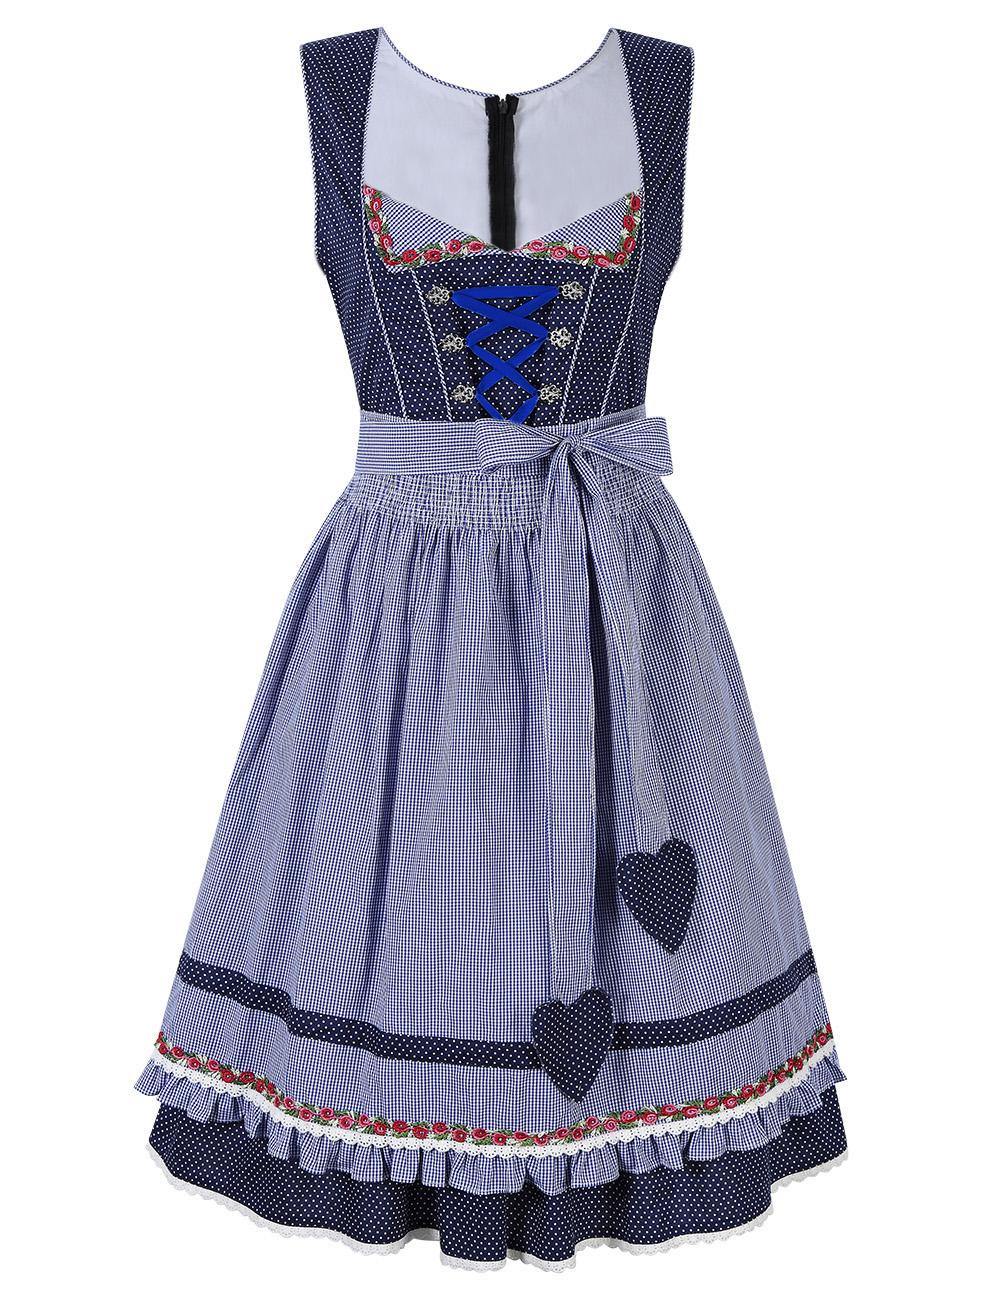 Kojooin Women's 2 Pcs Dirndl Dress Bavarian Beer Oktoberfest Costume Blue_Thirty-four